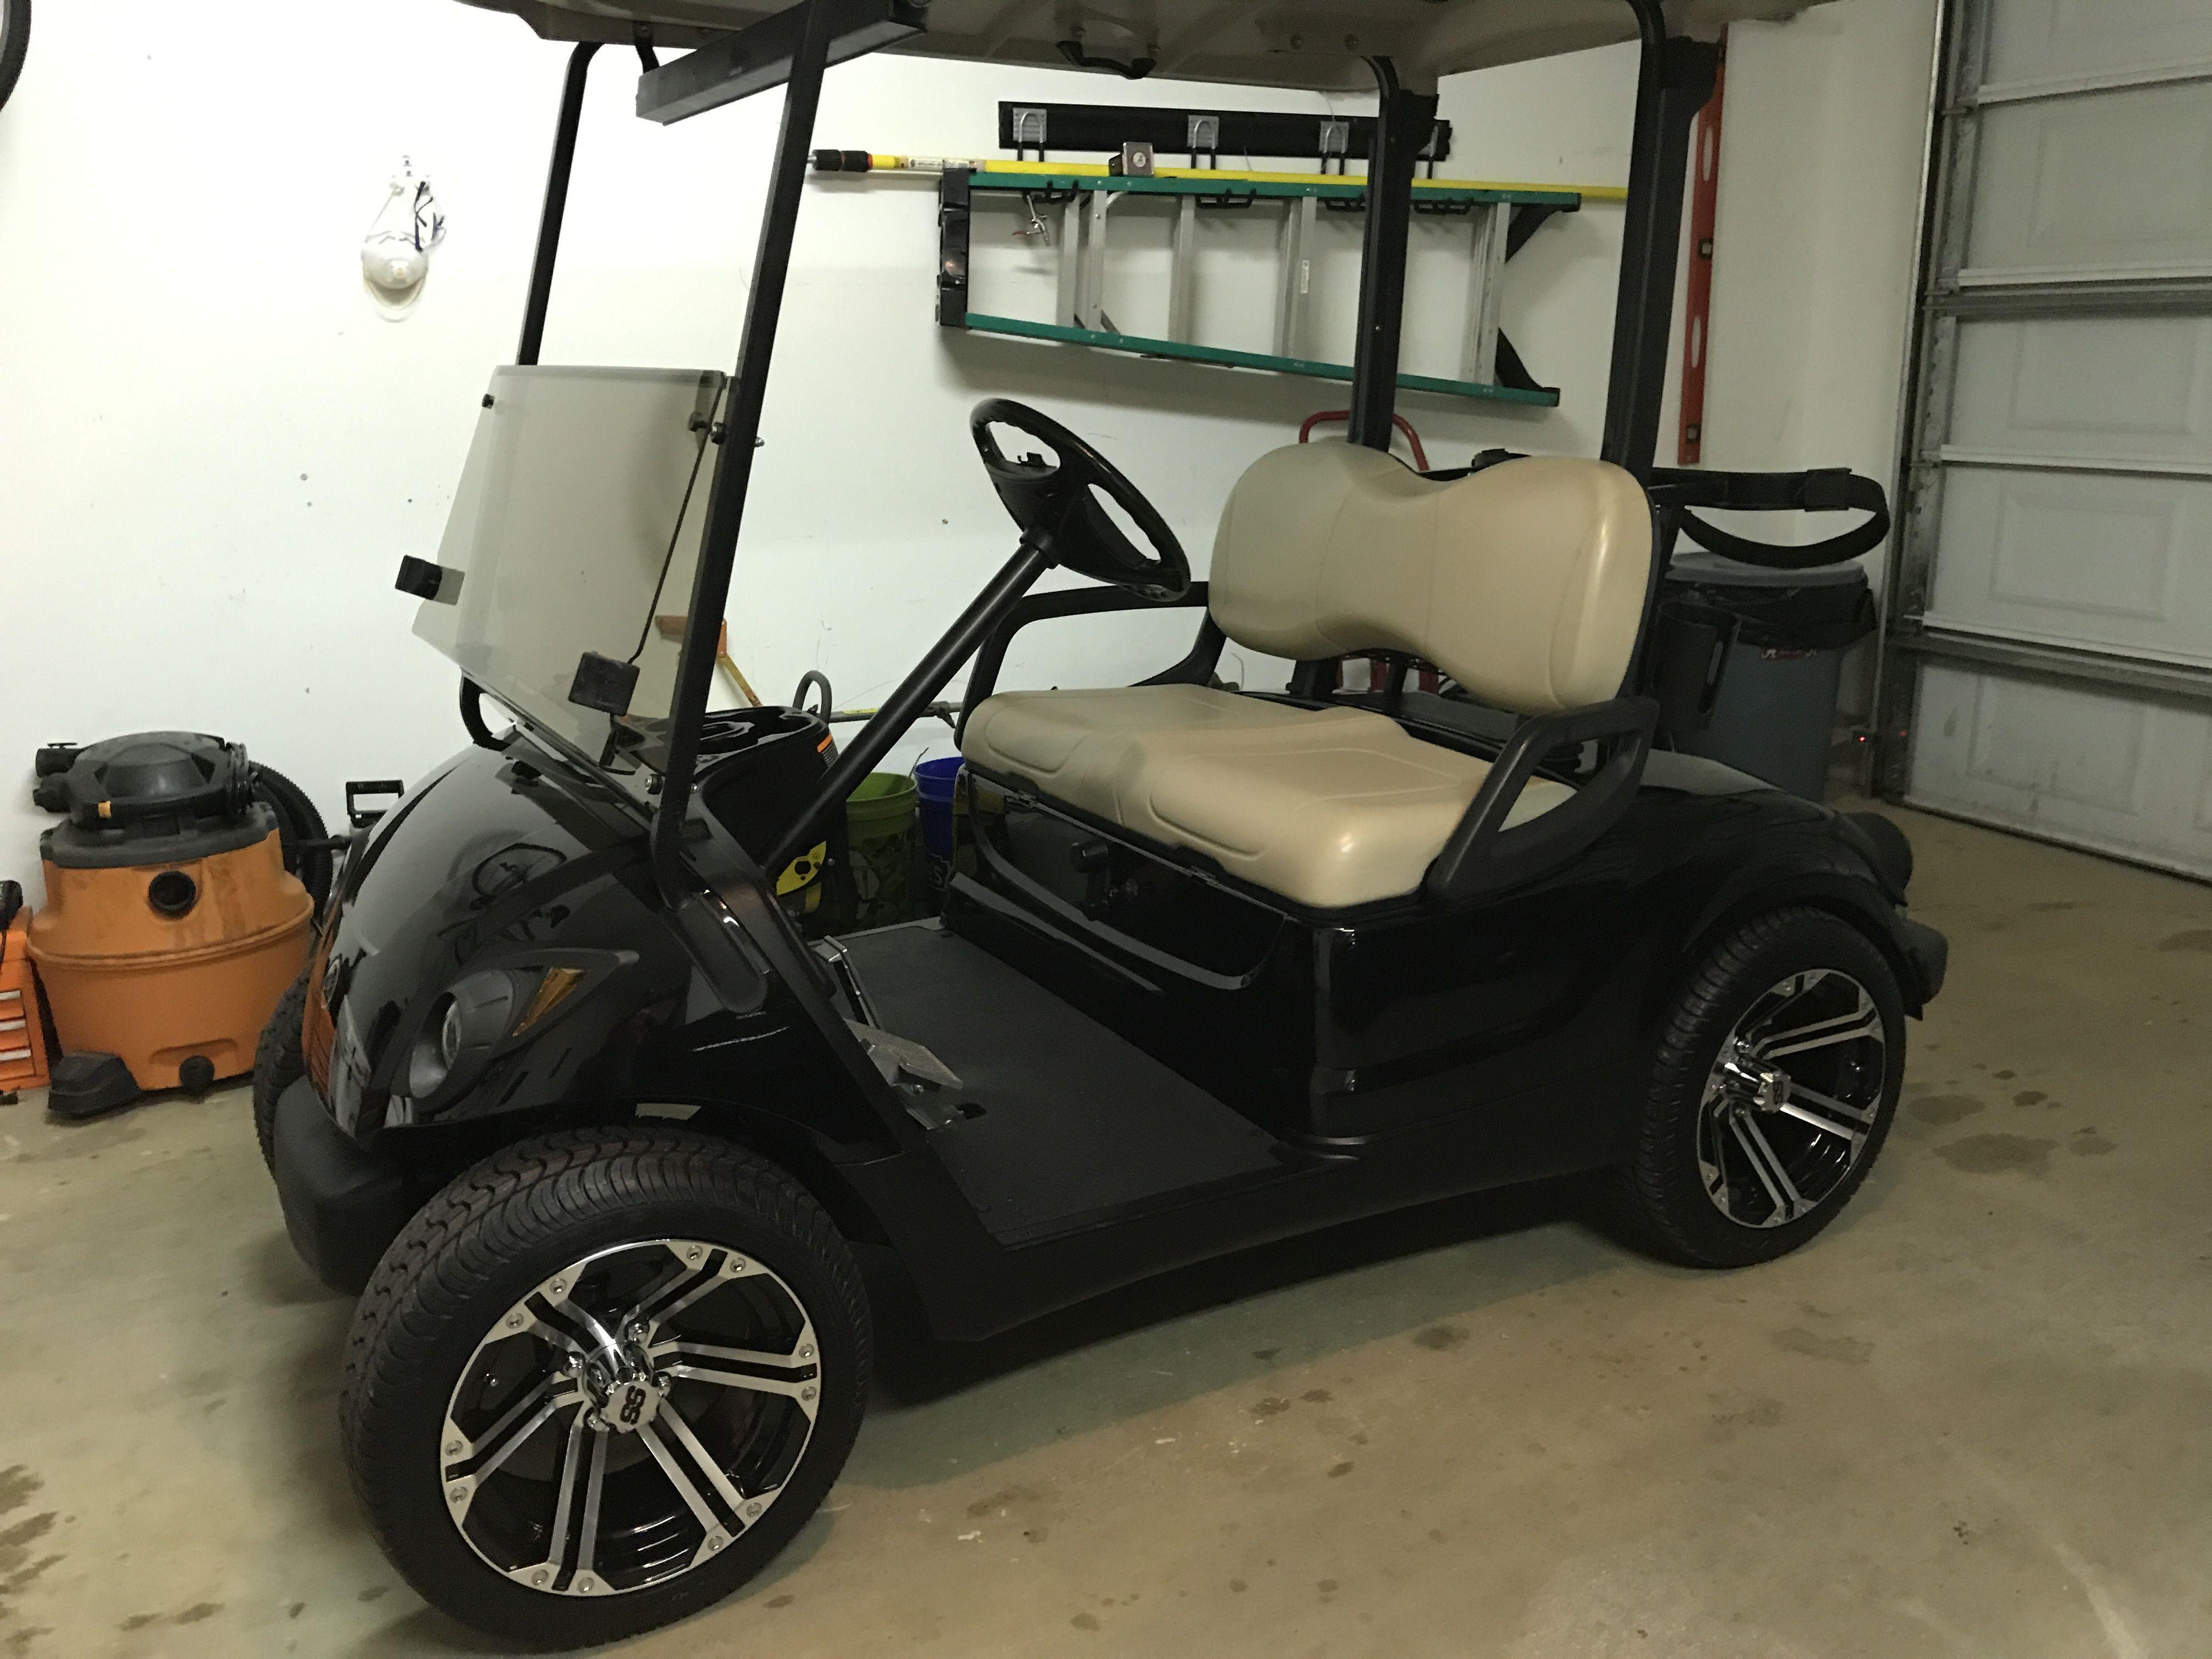 Yamaha golf cart with 14 inch wheels. | Golf Cart | Pinterest | Golf on yamaha side by side, yamaha utility, yamaha electric carts, used carts, gas powered carts, yamaha trailers, yamaha passenger carts, custom lifted carts, gasoline carts, ezgo carts, yamaha gas carts,